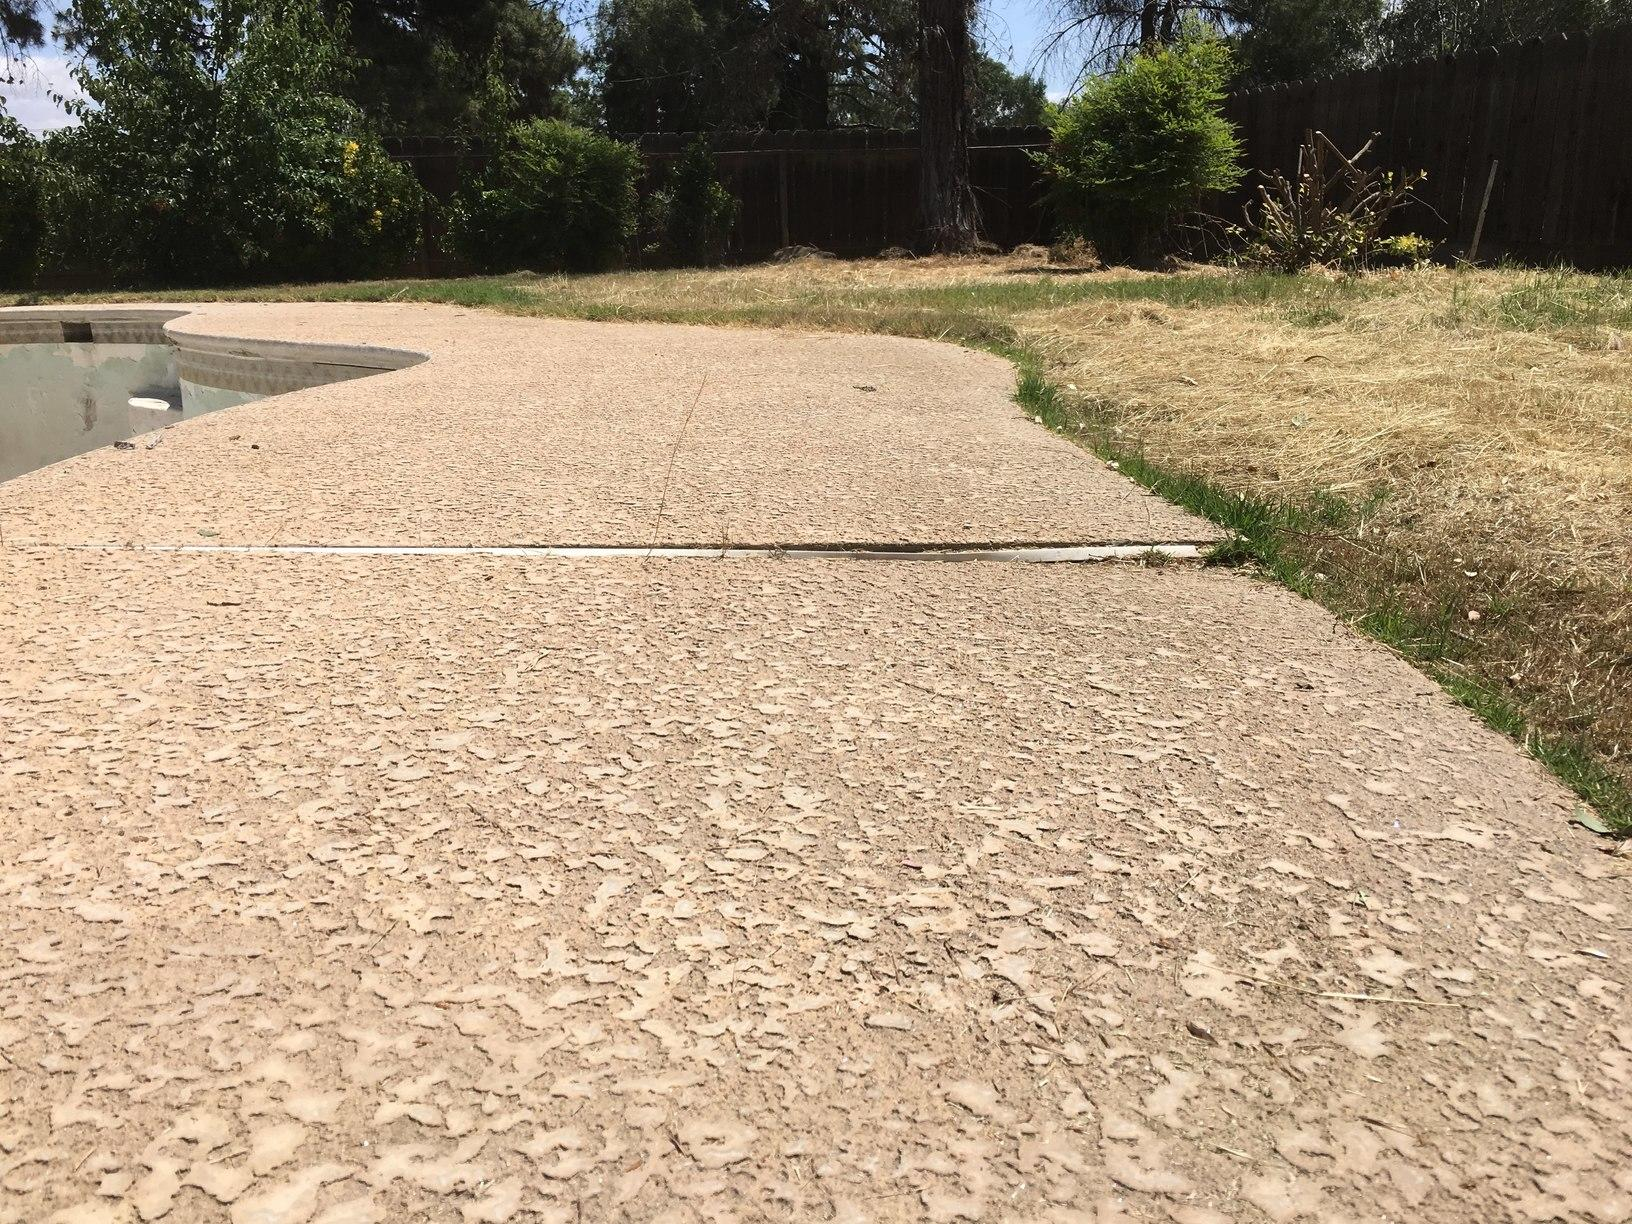 Sunken Pool in Clovis, CA - Before Photo